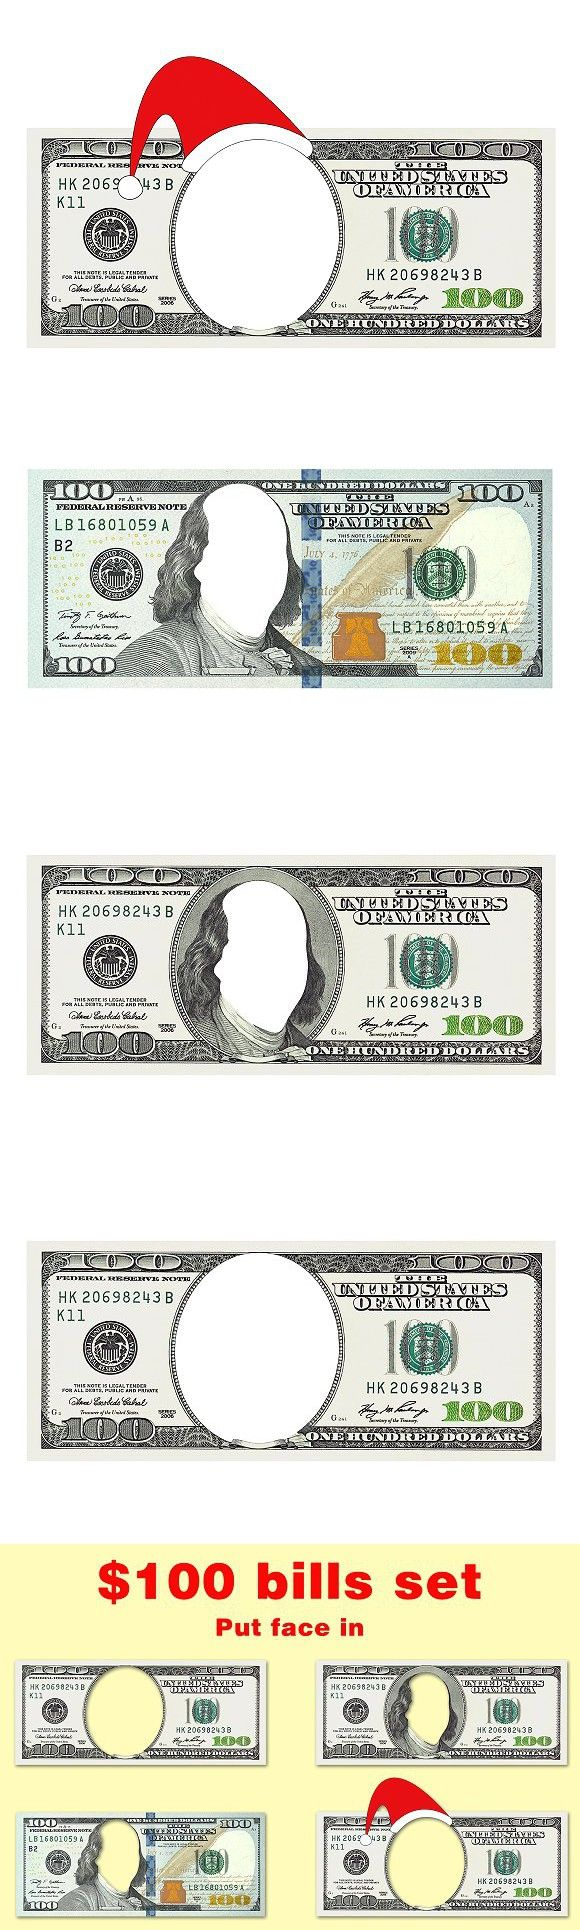 Set Of 100 Bills With No Face Money Collection Bills 100 Dollar Bill